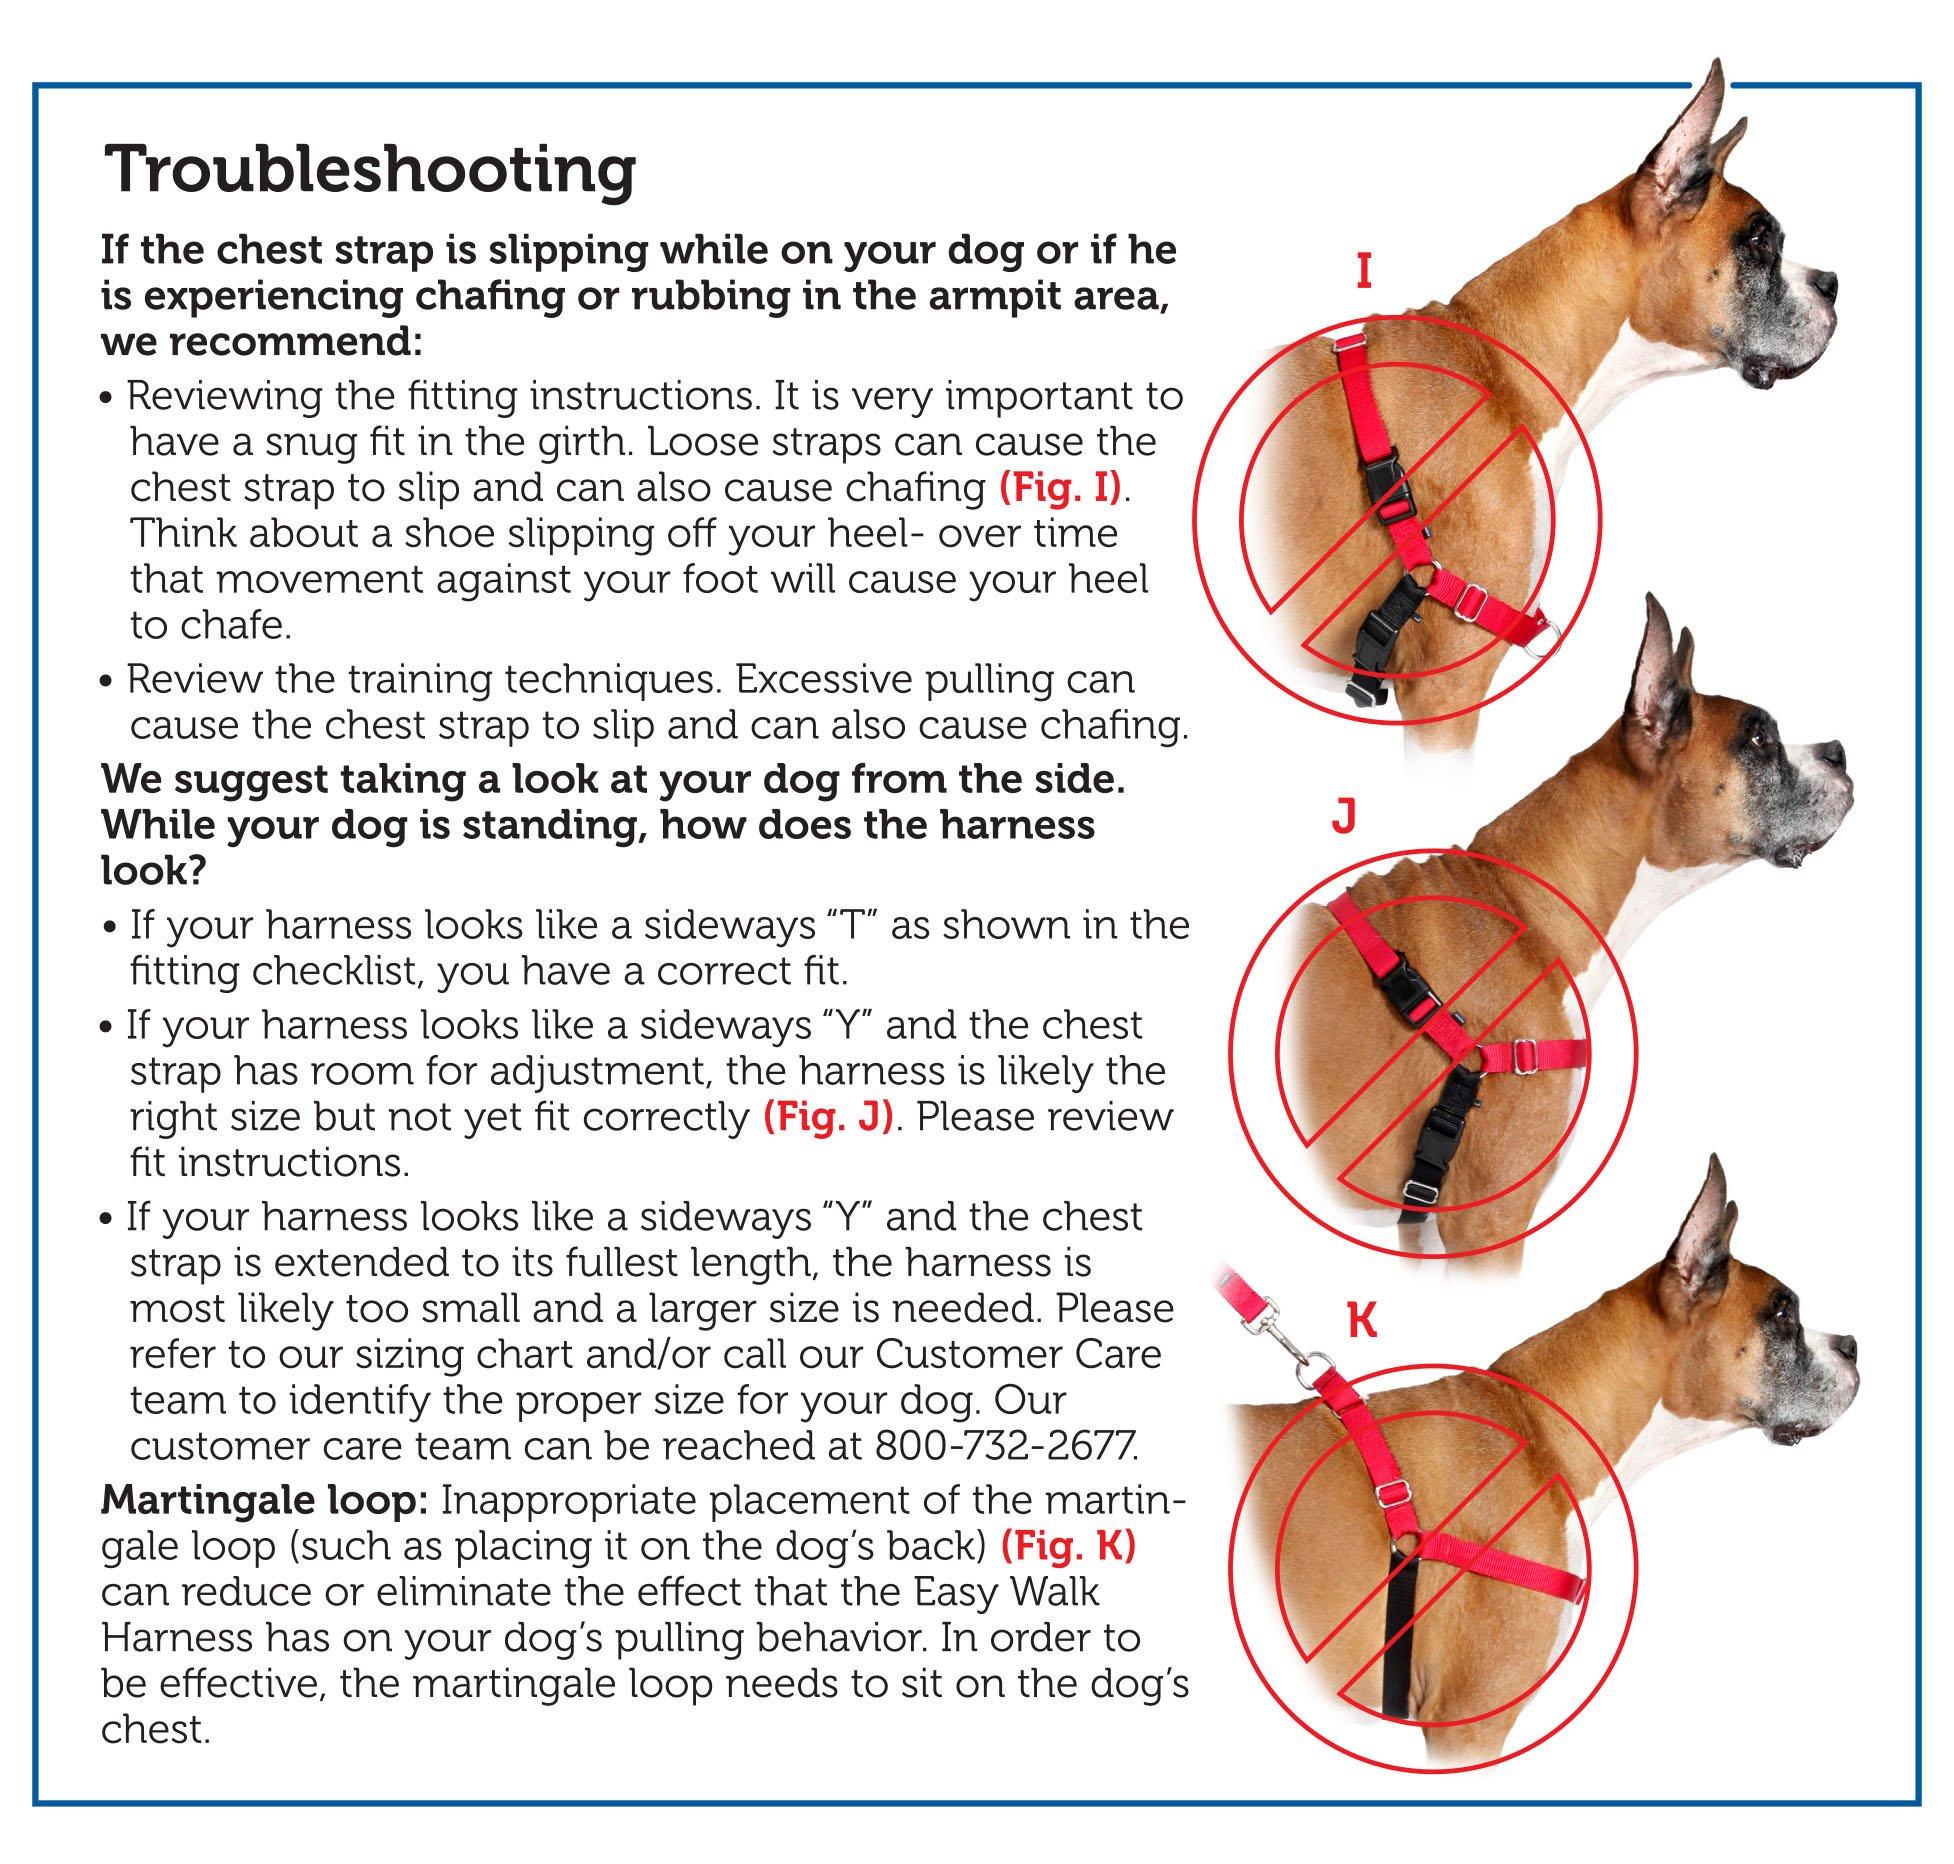 PetSafe Easy Walk Harness, Medium/Large, BLACK/SILVER for Dogs by PetSafe (Image #8)